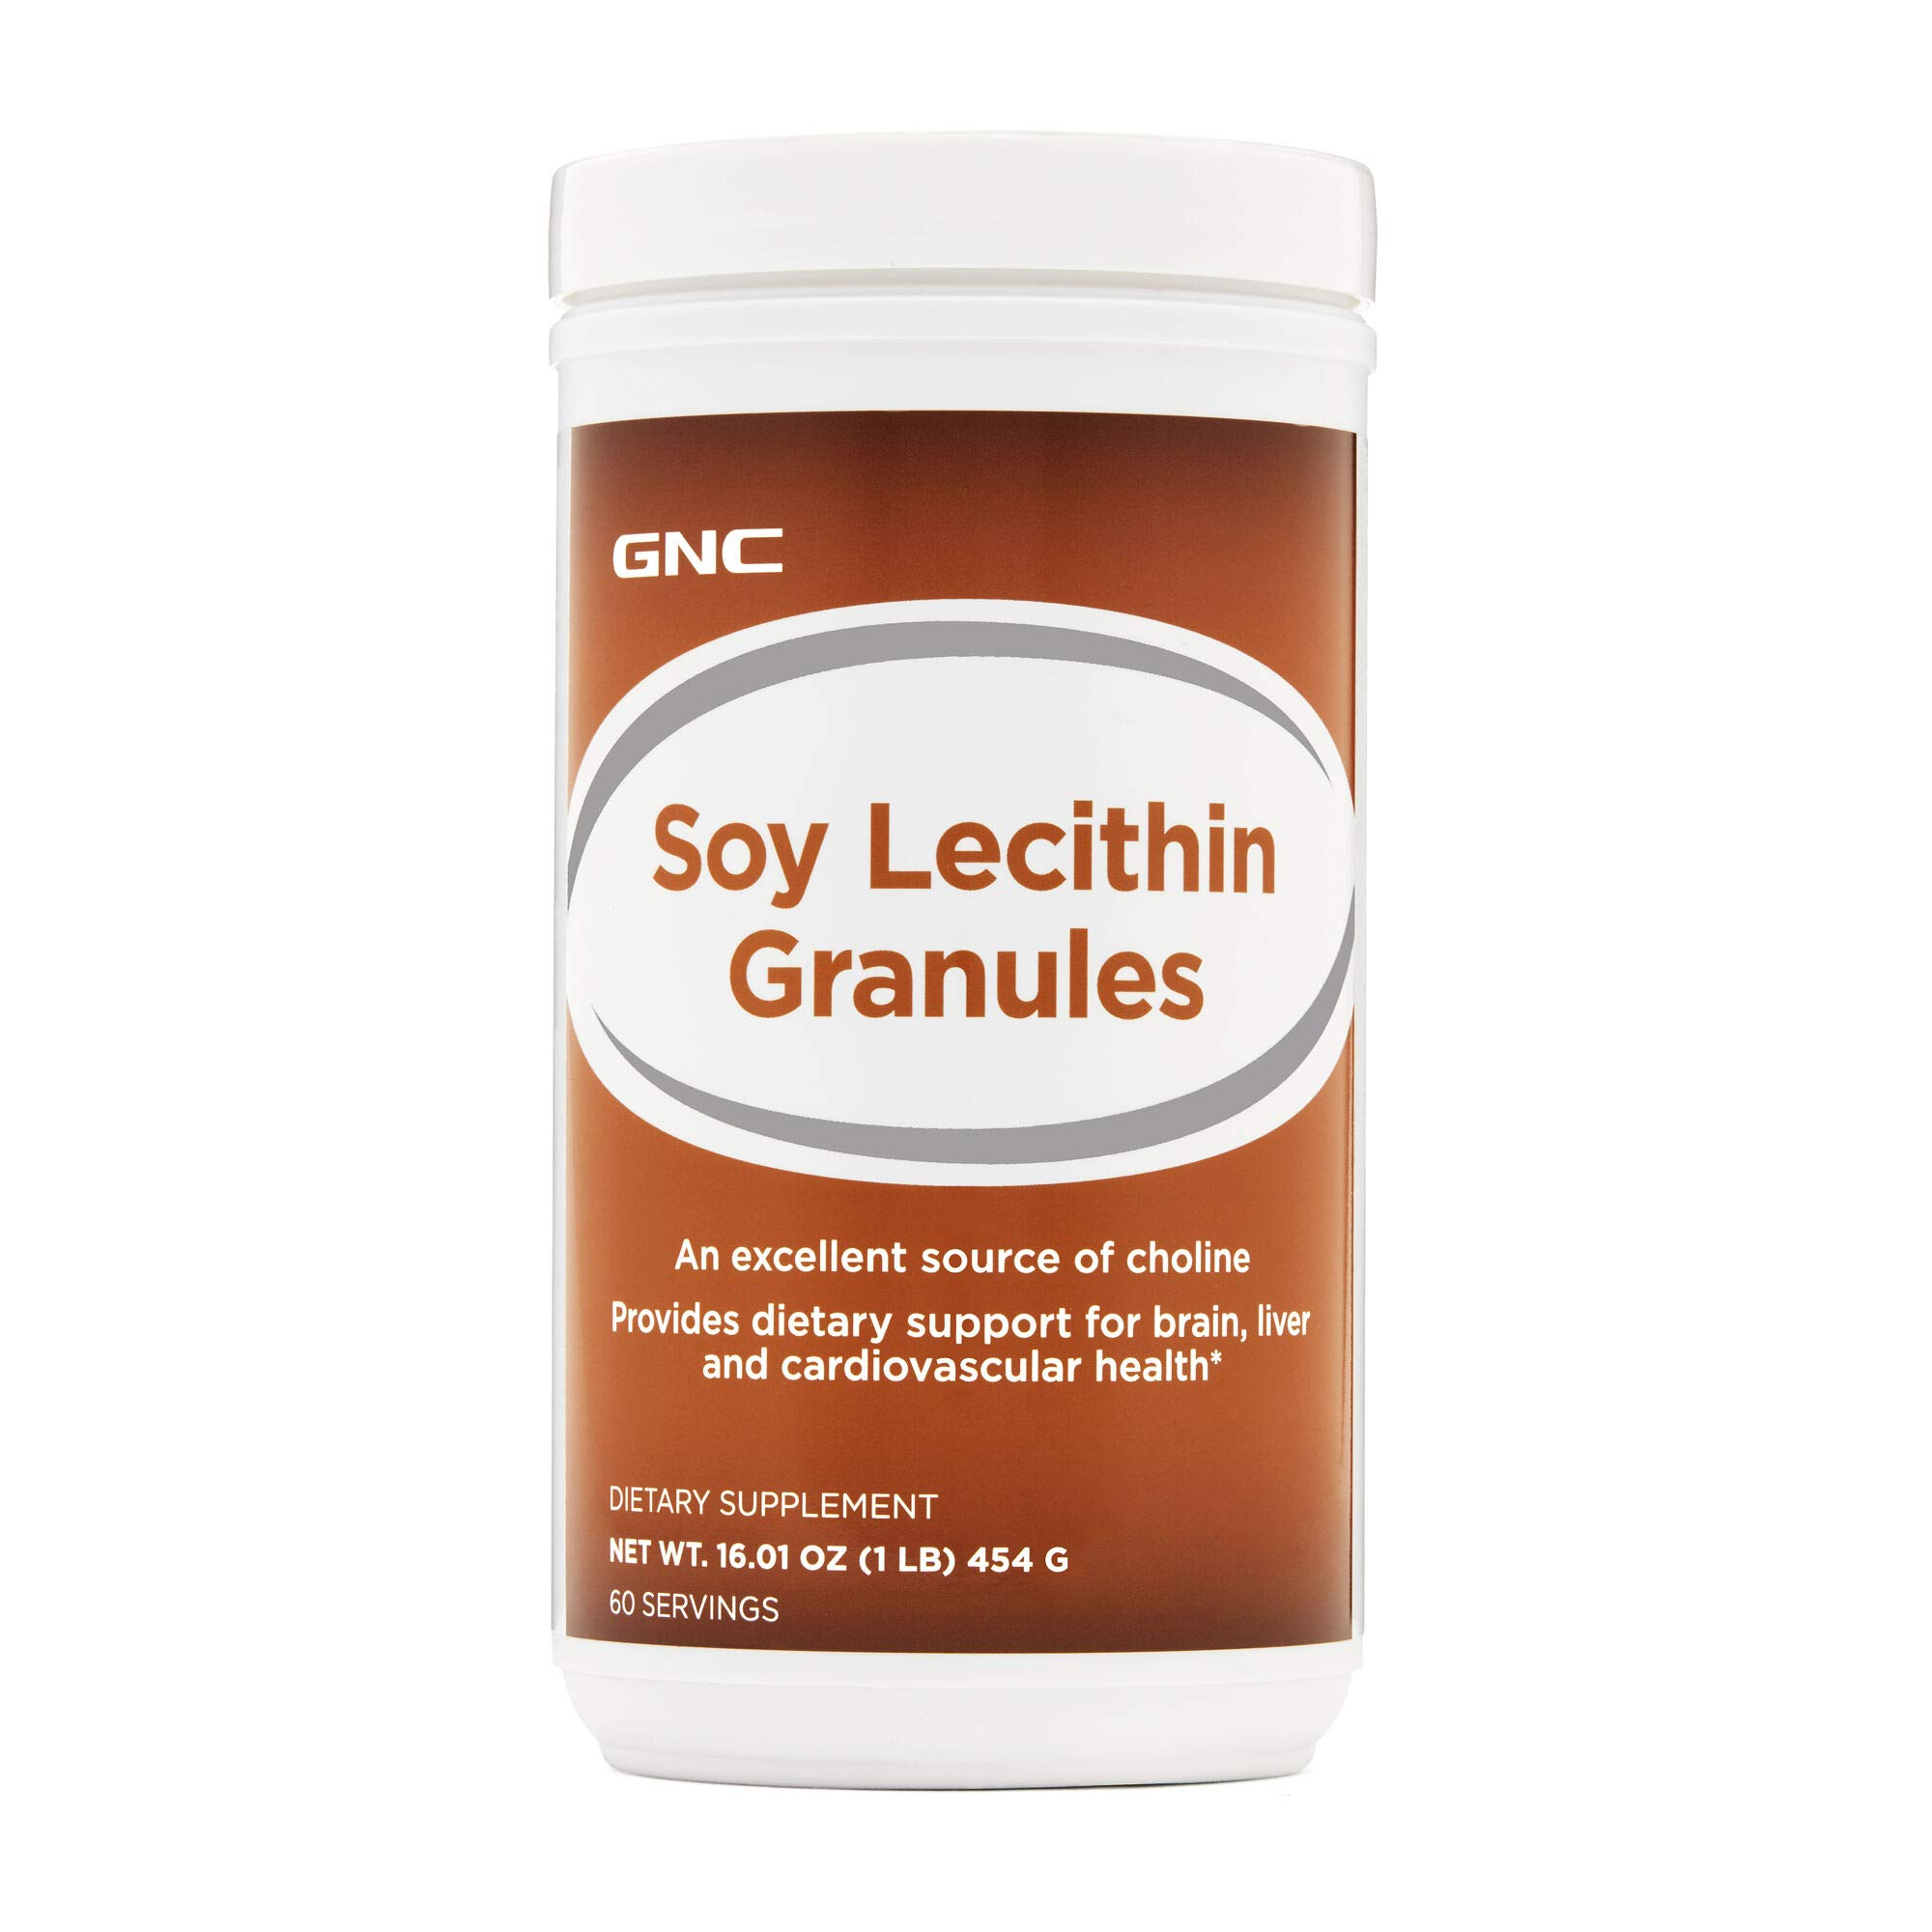 GNC Soy Lecithin Granules by GNC